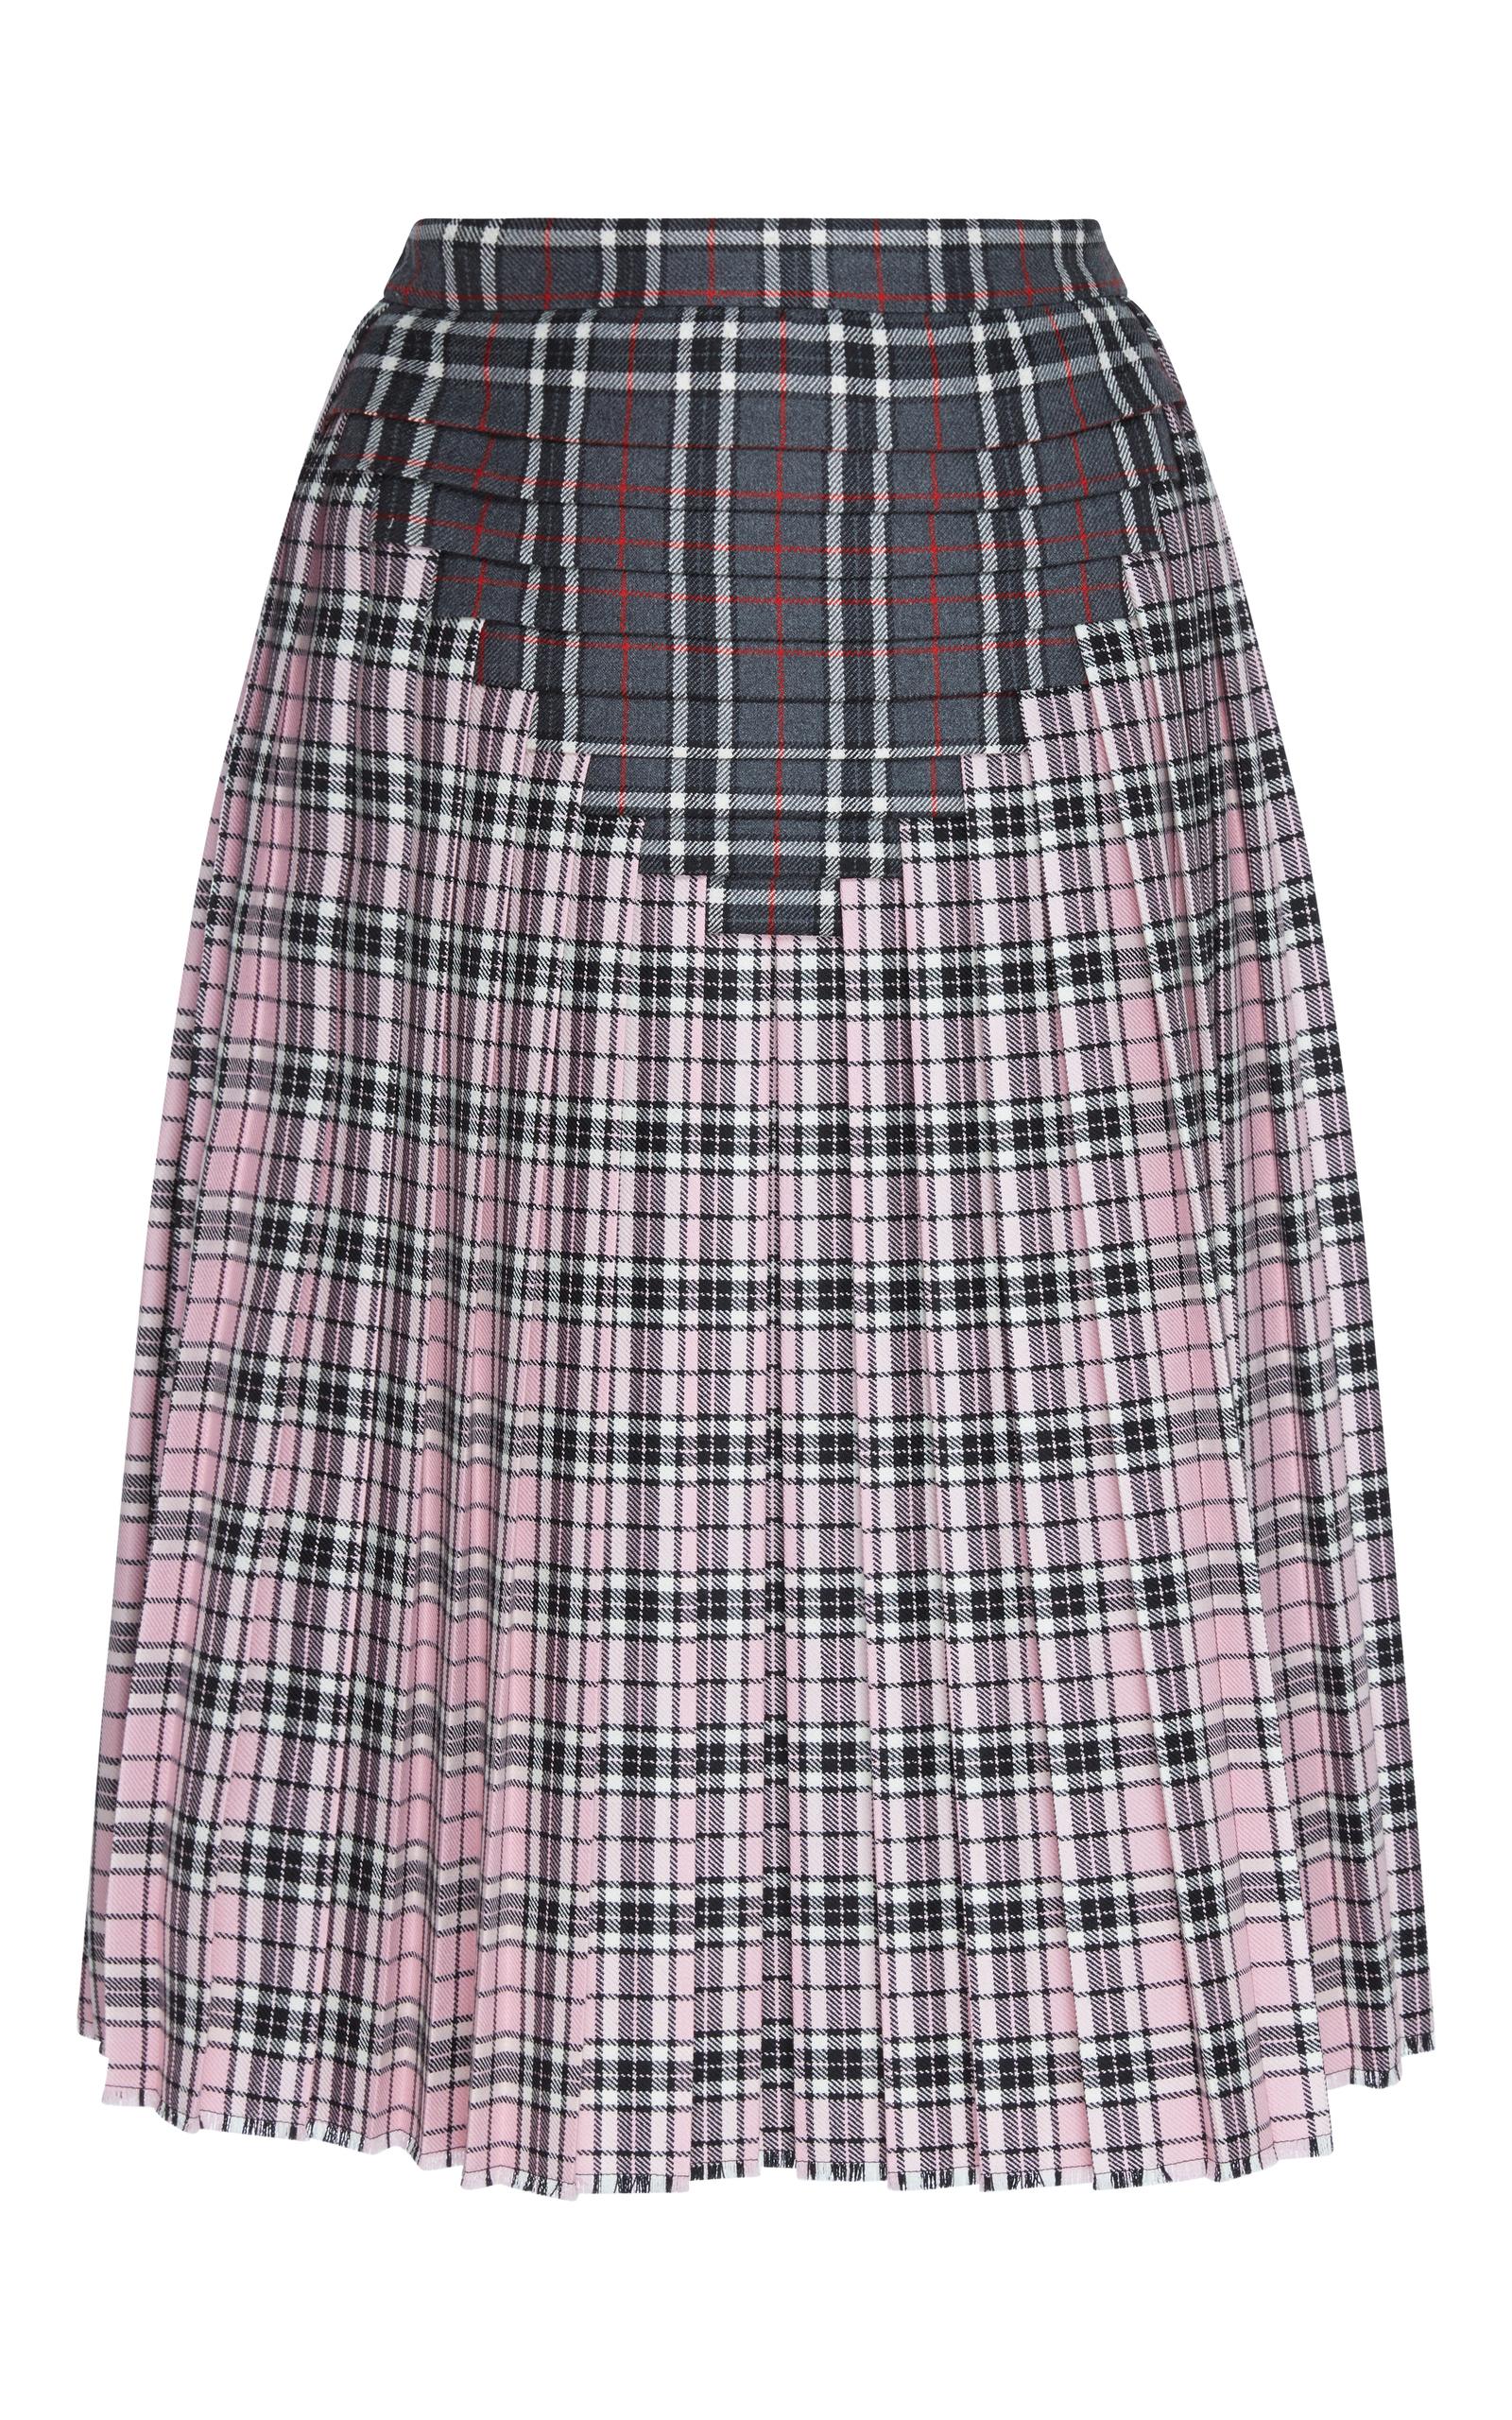 1bbfda78aa Printed Pleated Skirt by Marco de Vincenzo   Moda Operandi